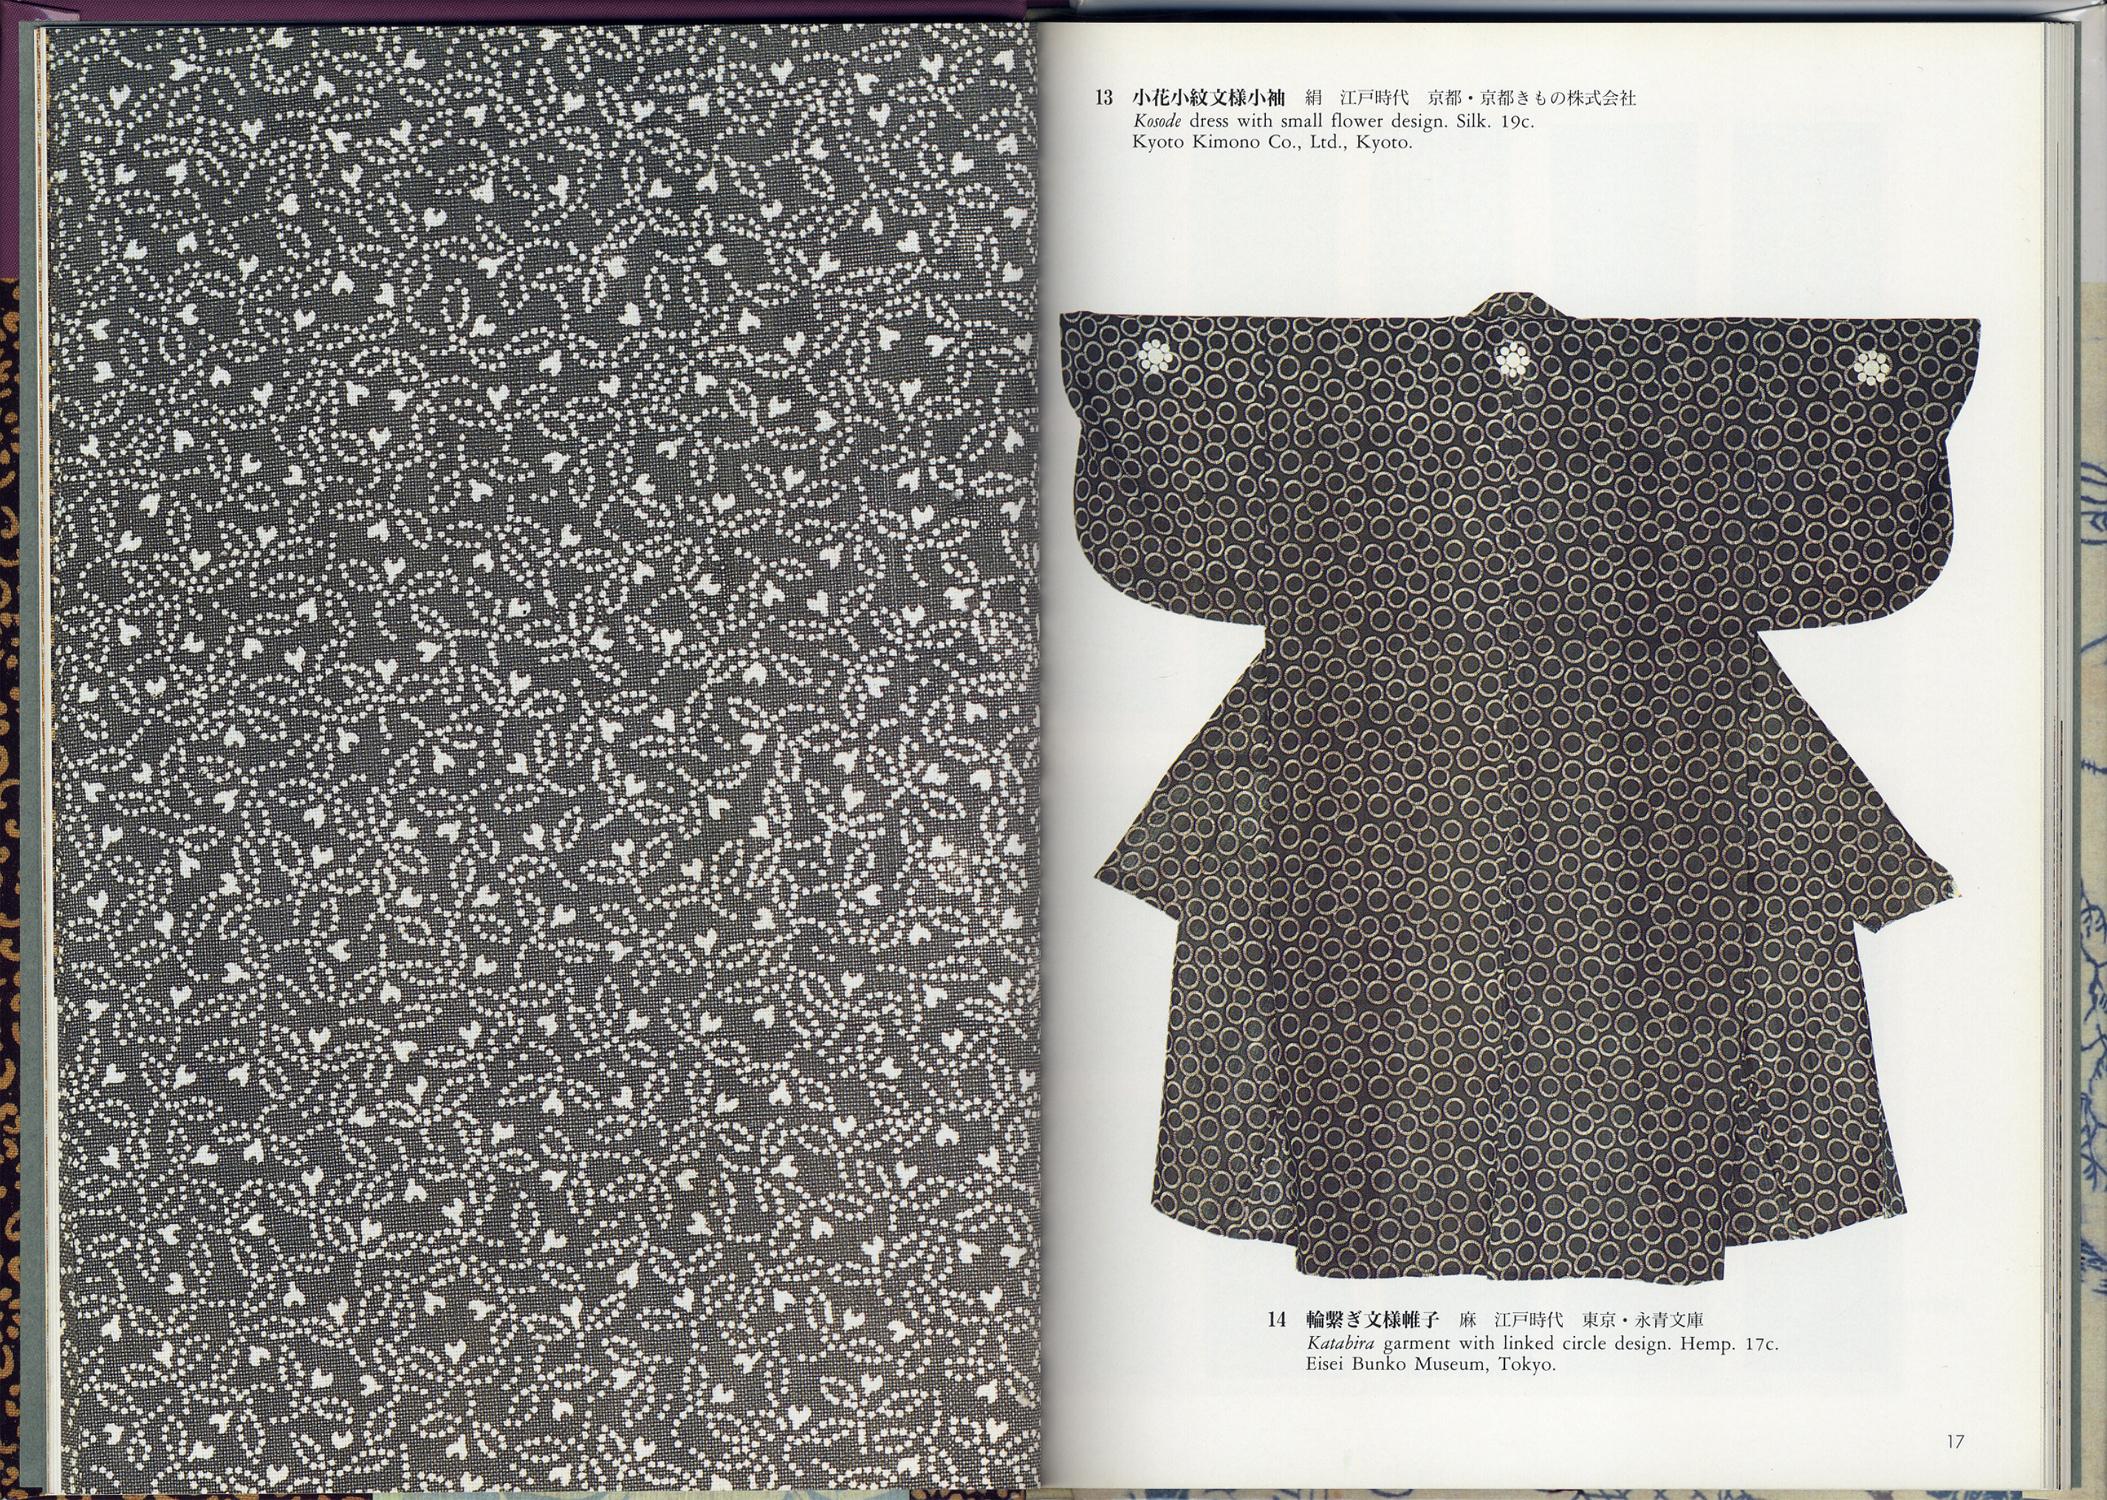 型染・小紋・中形 Katazome、 Komon、 Chūgata 日本の染織15[image2]